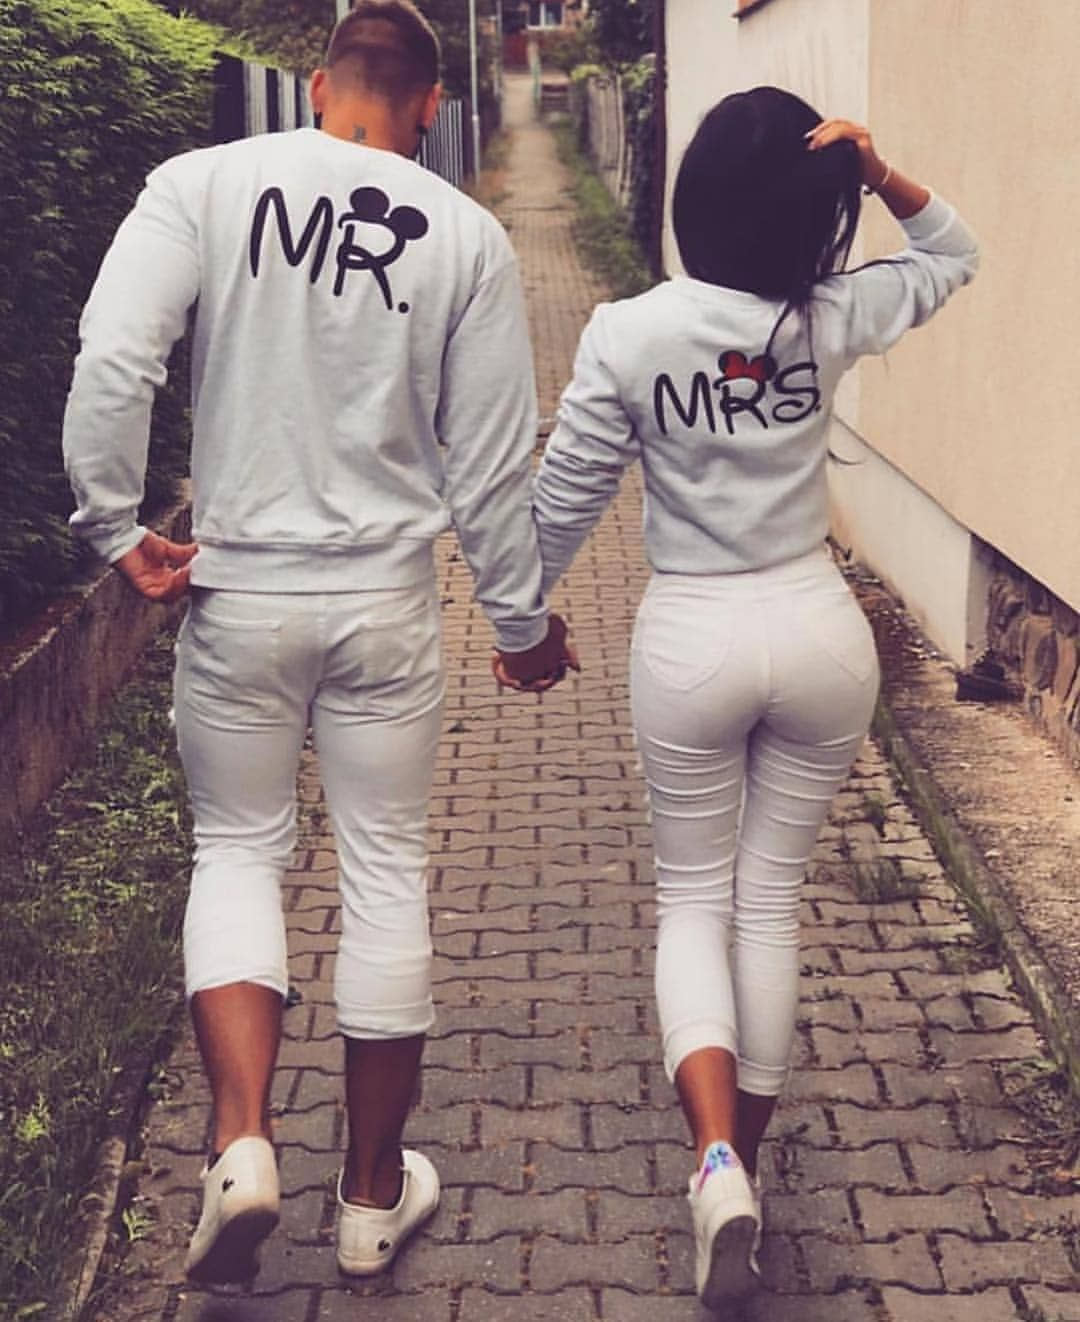 2019 year lifestyle- Swag couple photography